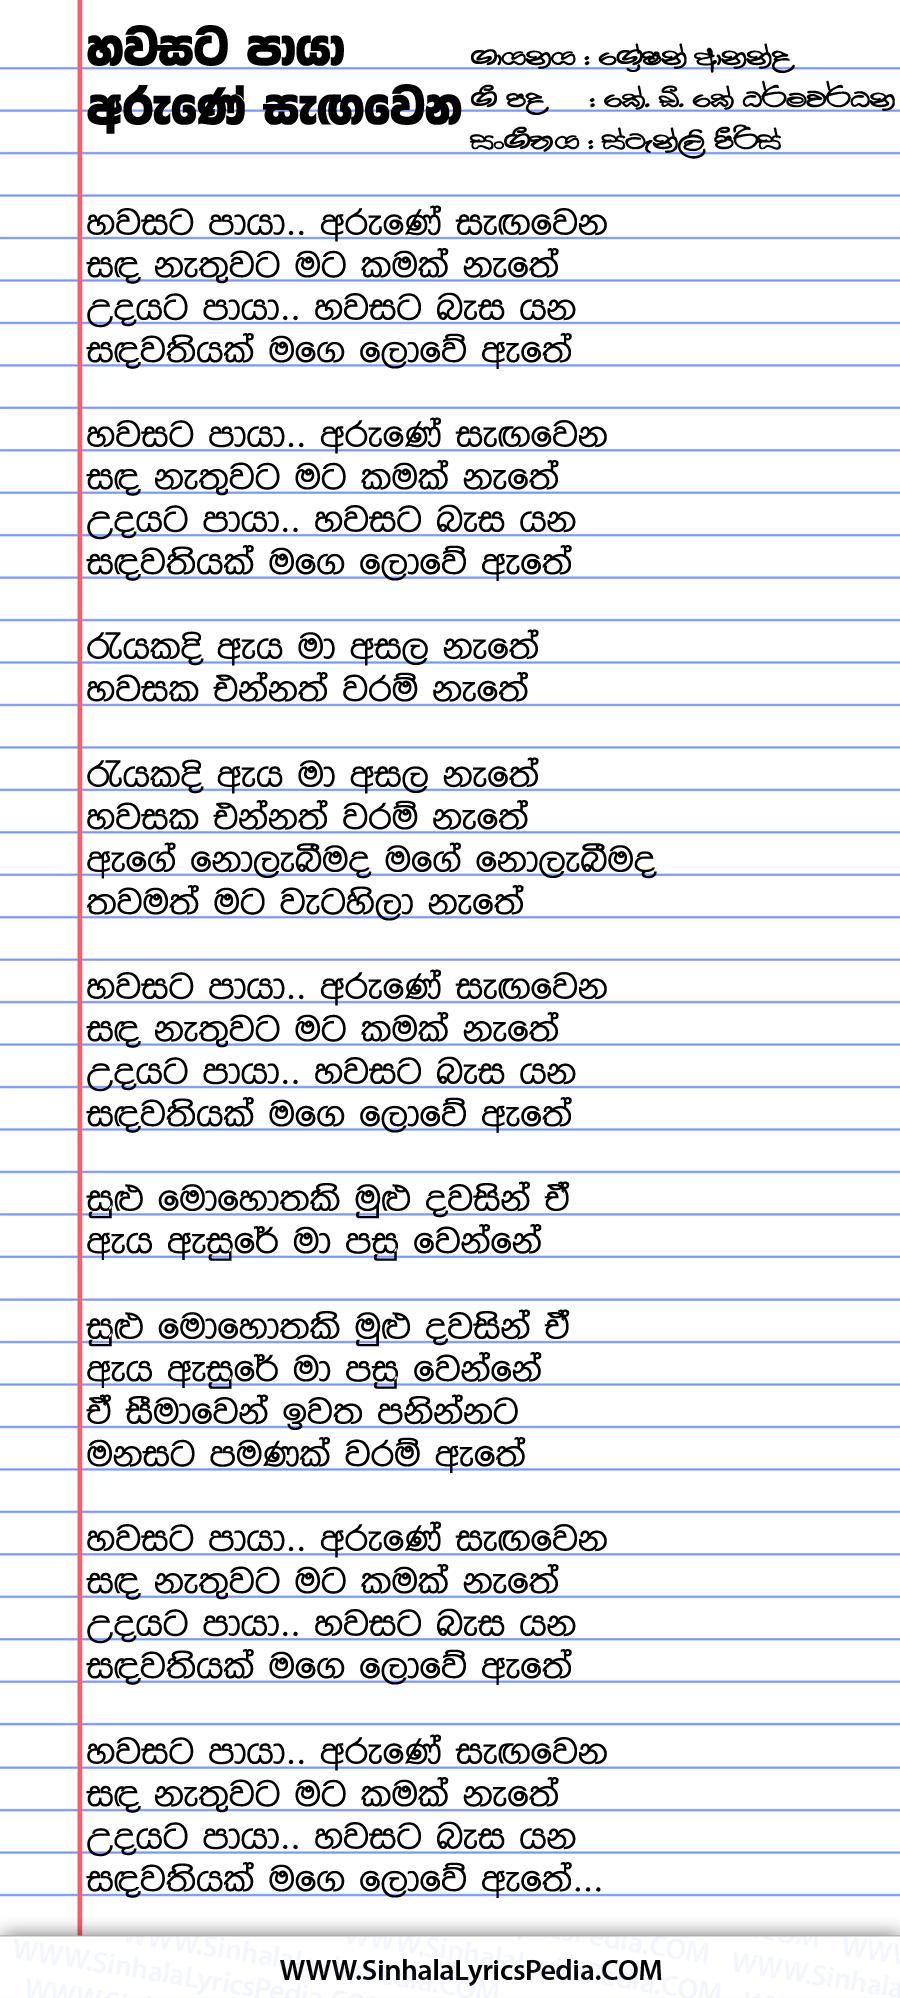 Hawasata Paya Arune Sagawena Song Lyrics